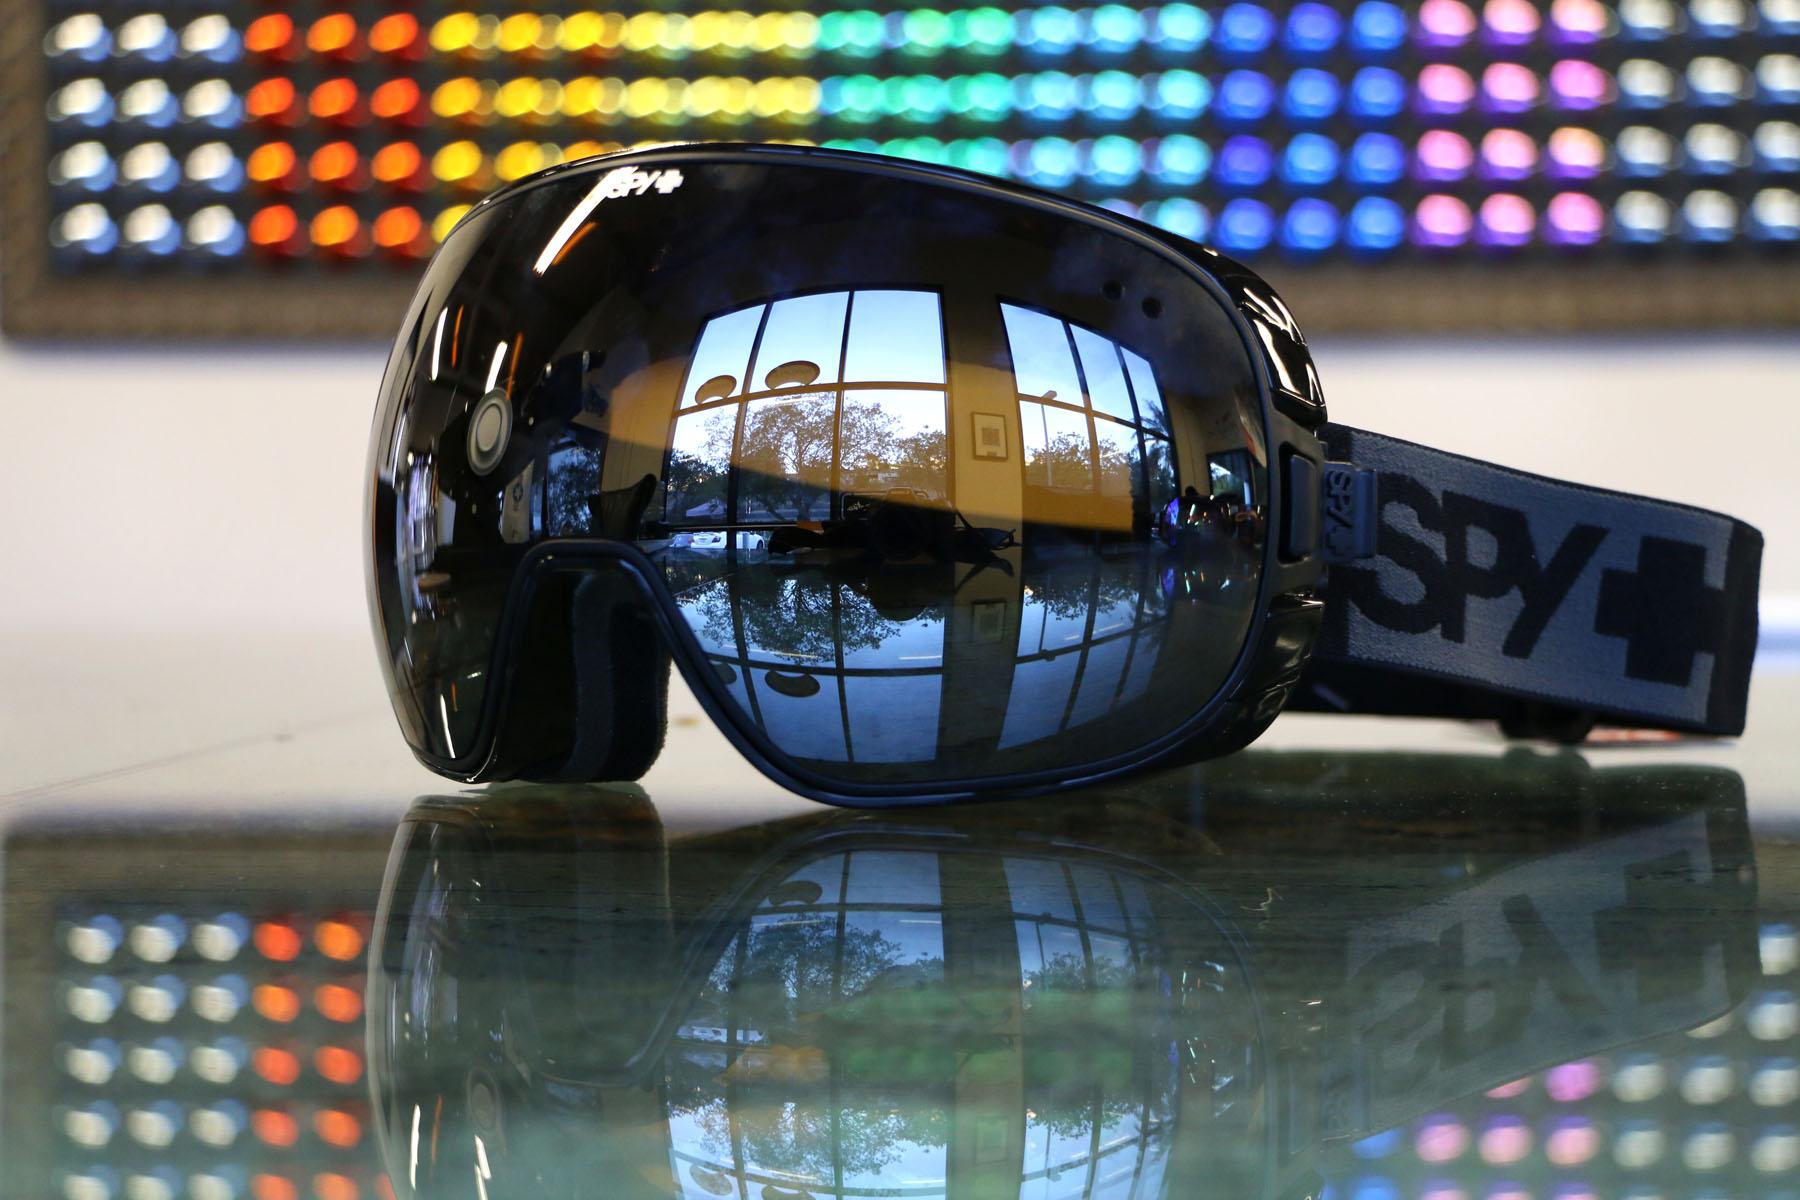 Spy Doom Prescription Ski Goggles & Snowboarding Goggles